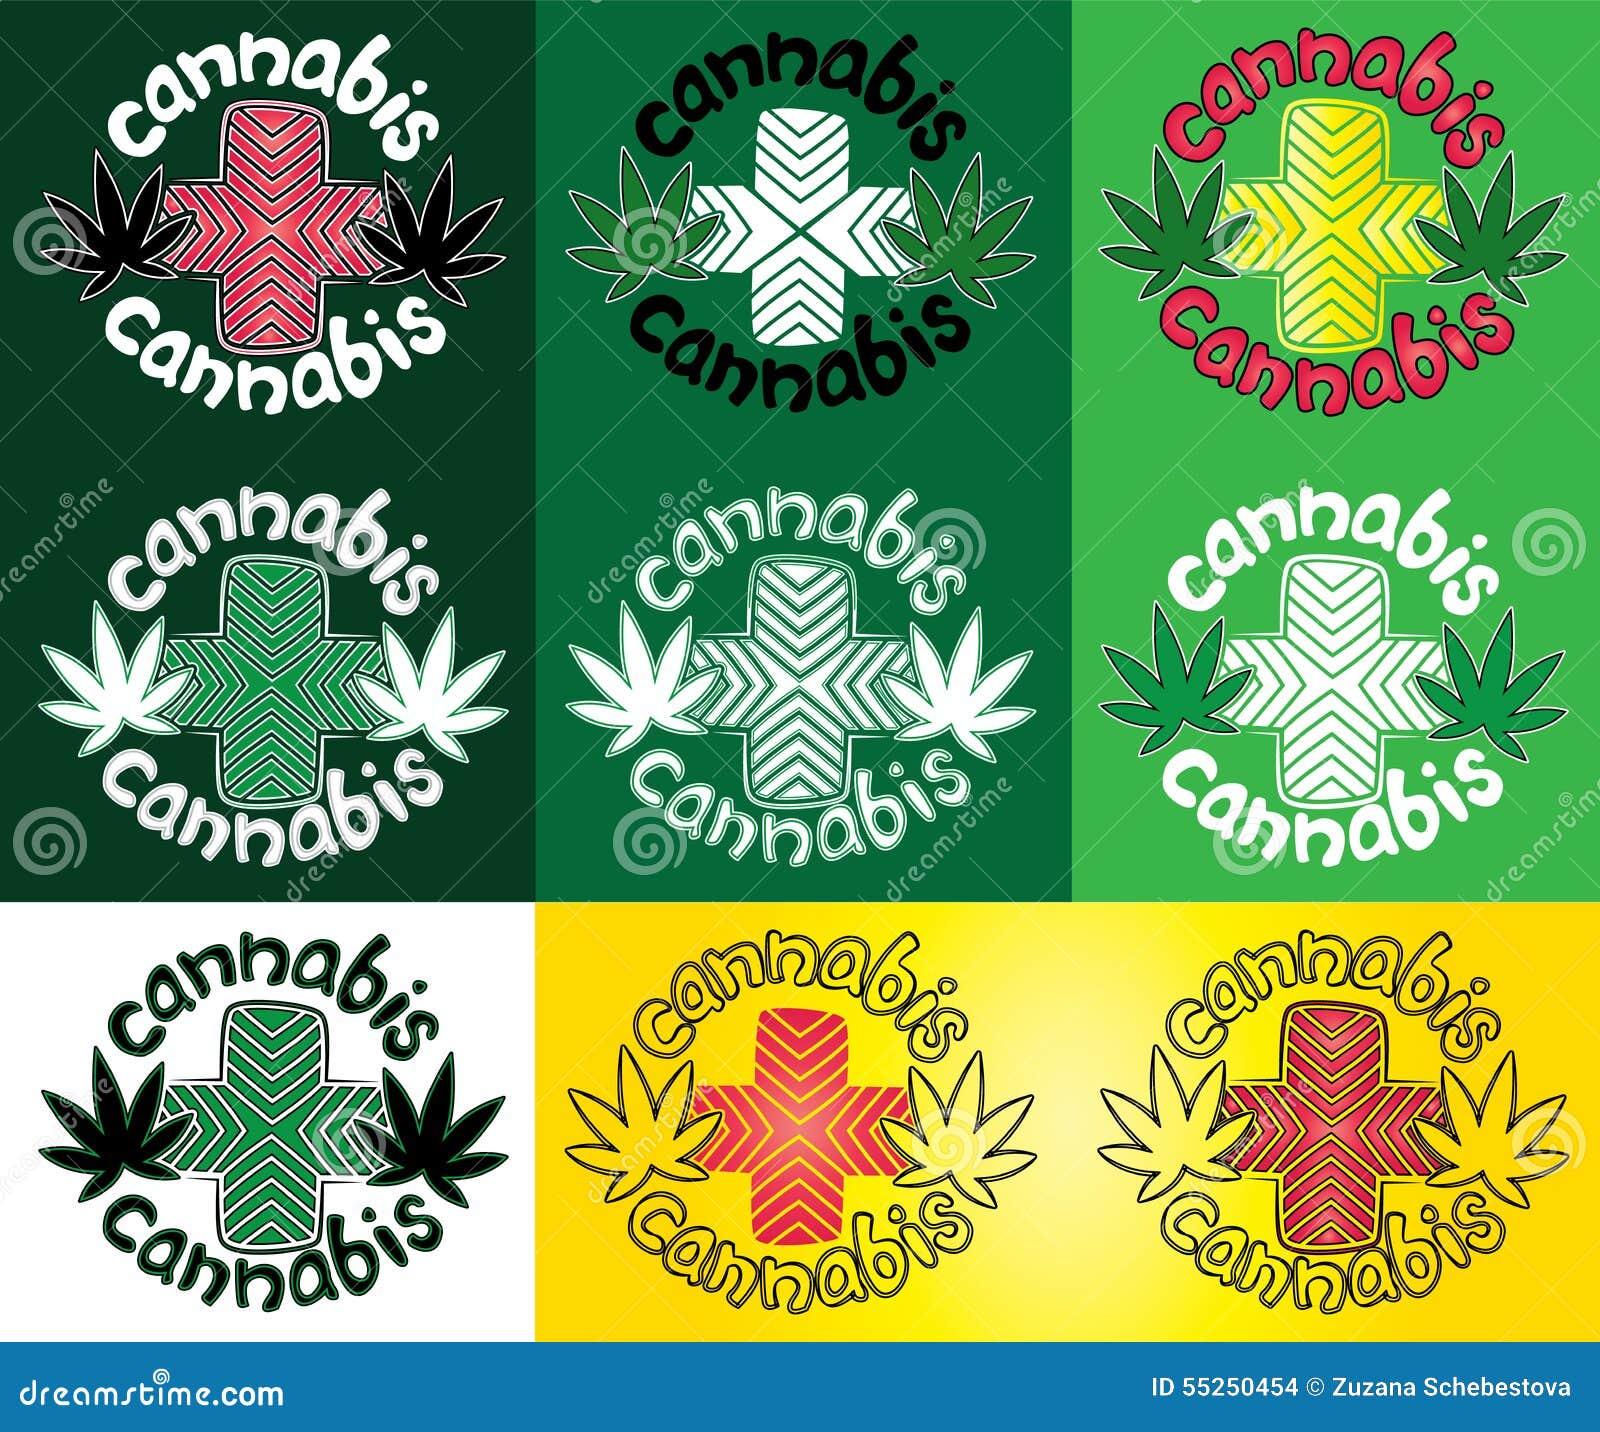 Ganja cannabis marijuana leaf with design cross symbol stamp ganja cannabis marijuana leaf with design cross symbol stamp illustration biocorpaavc